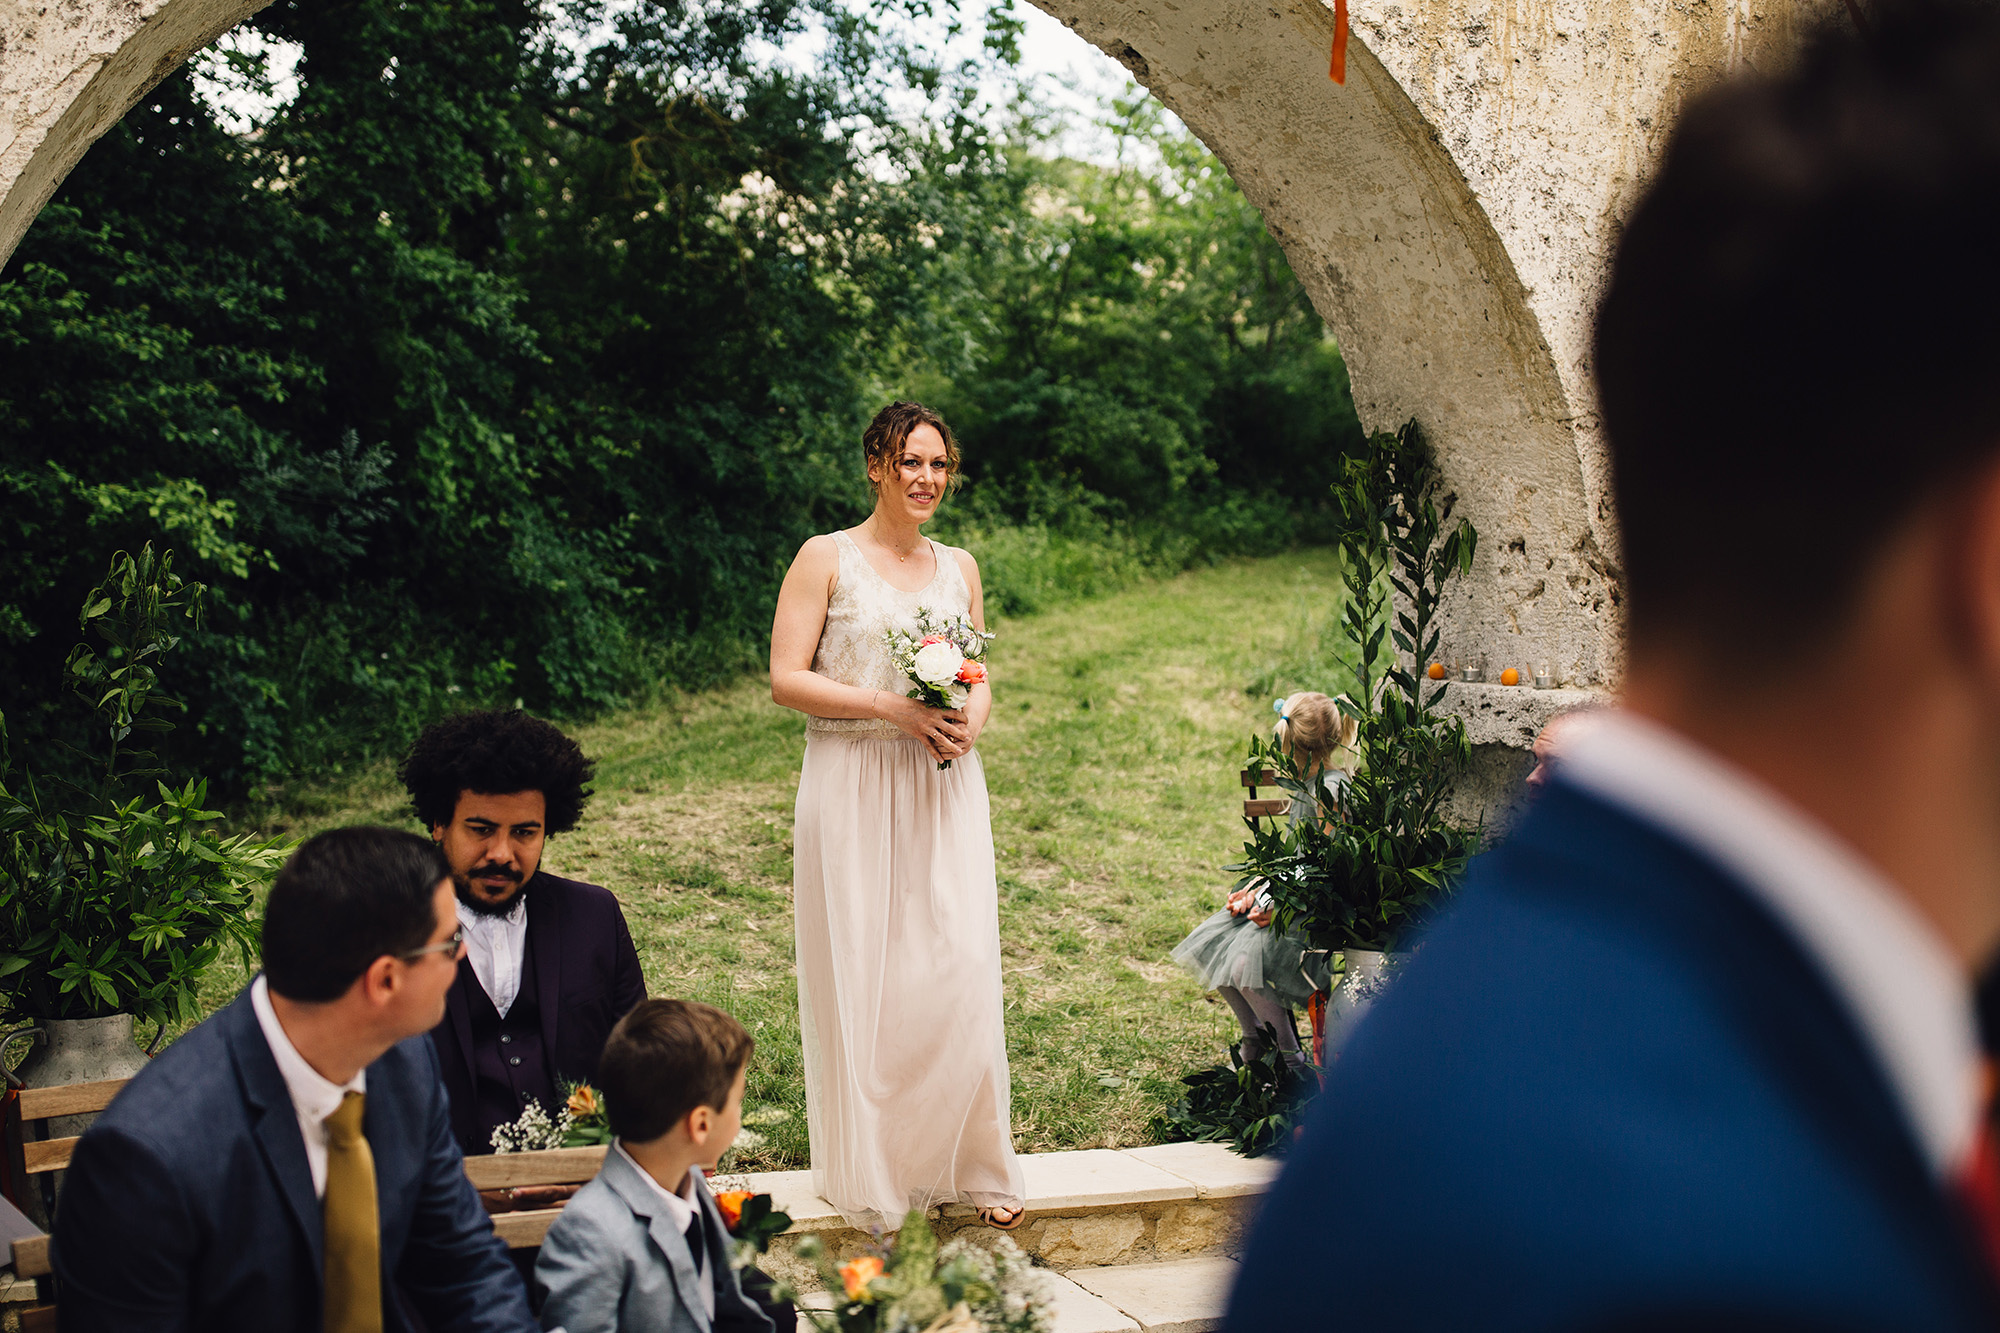 Hannah-Bespoke-Bridesmaids-Bohemian-French-Wedding-Gold-Lace-Susanna-Greening-Designs-Matlock-Derbyshire-11